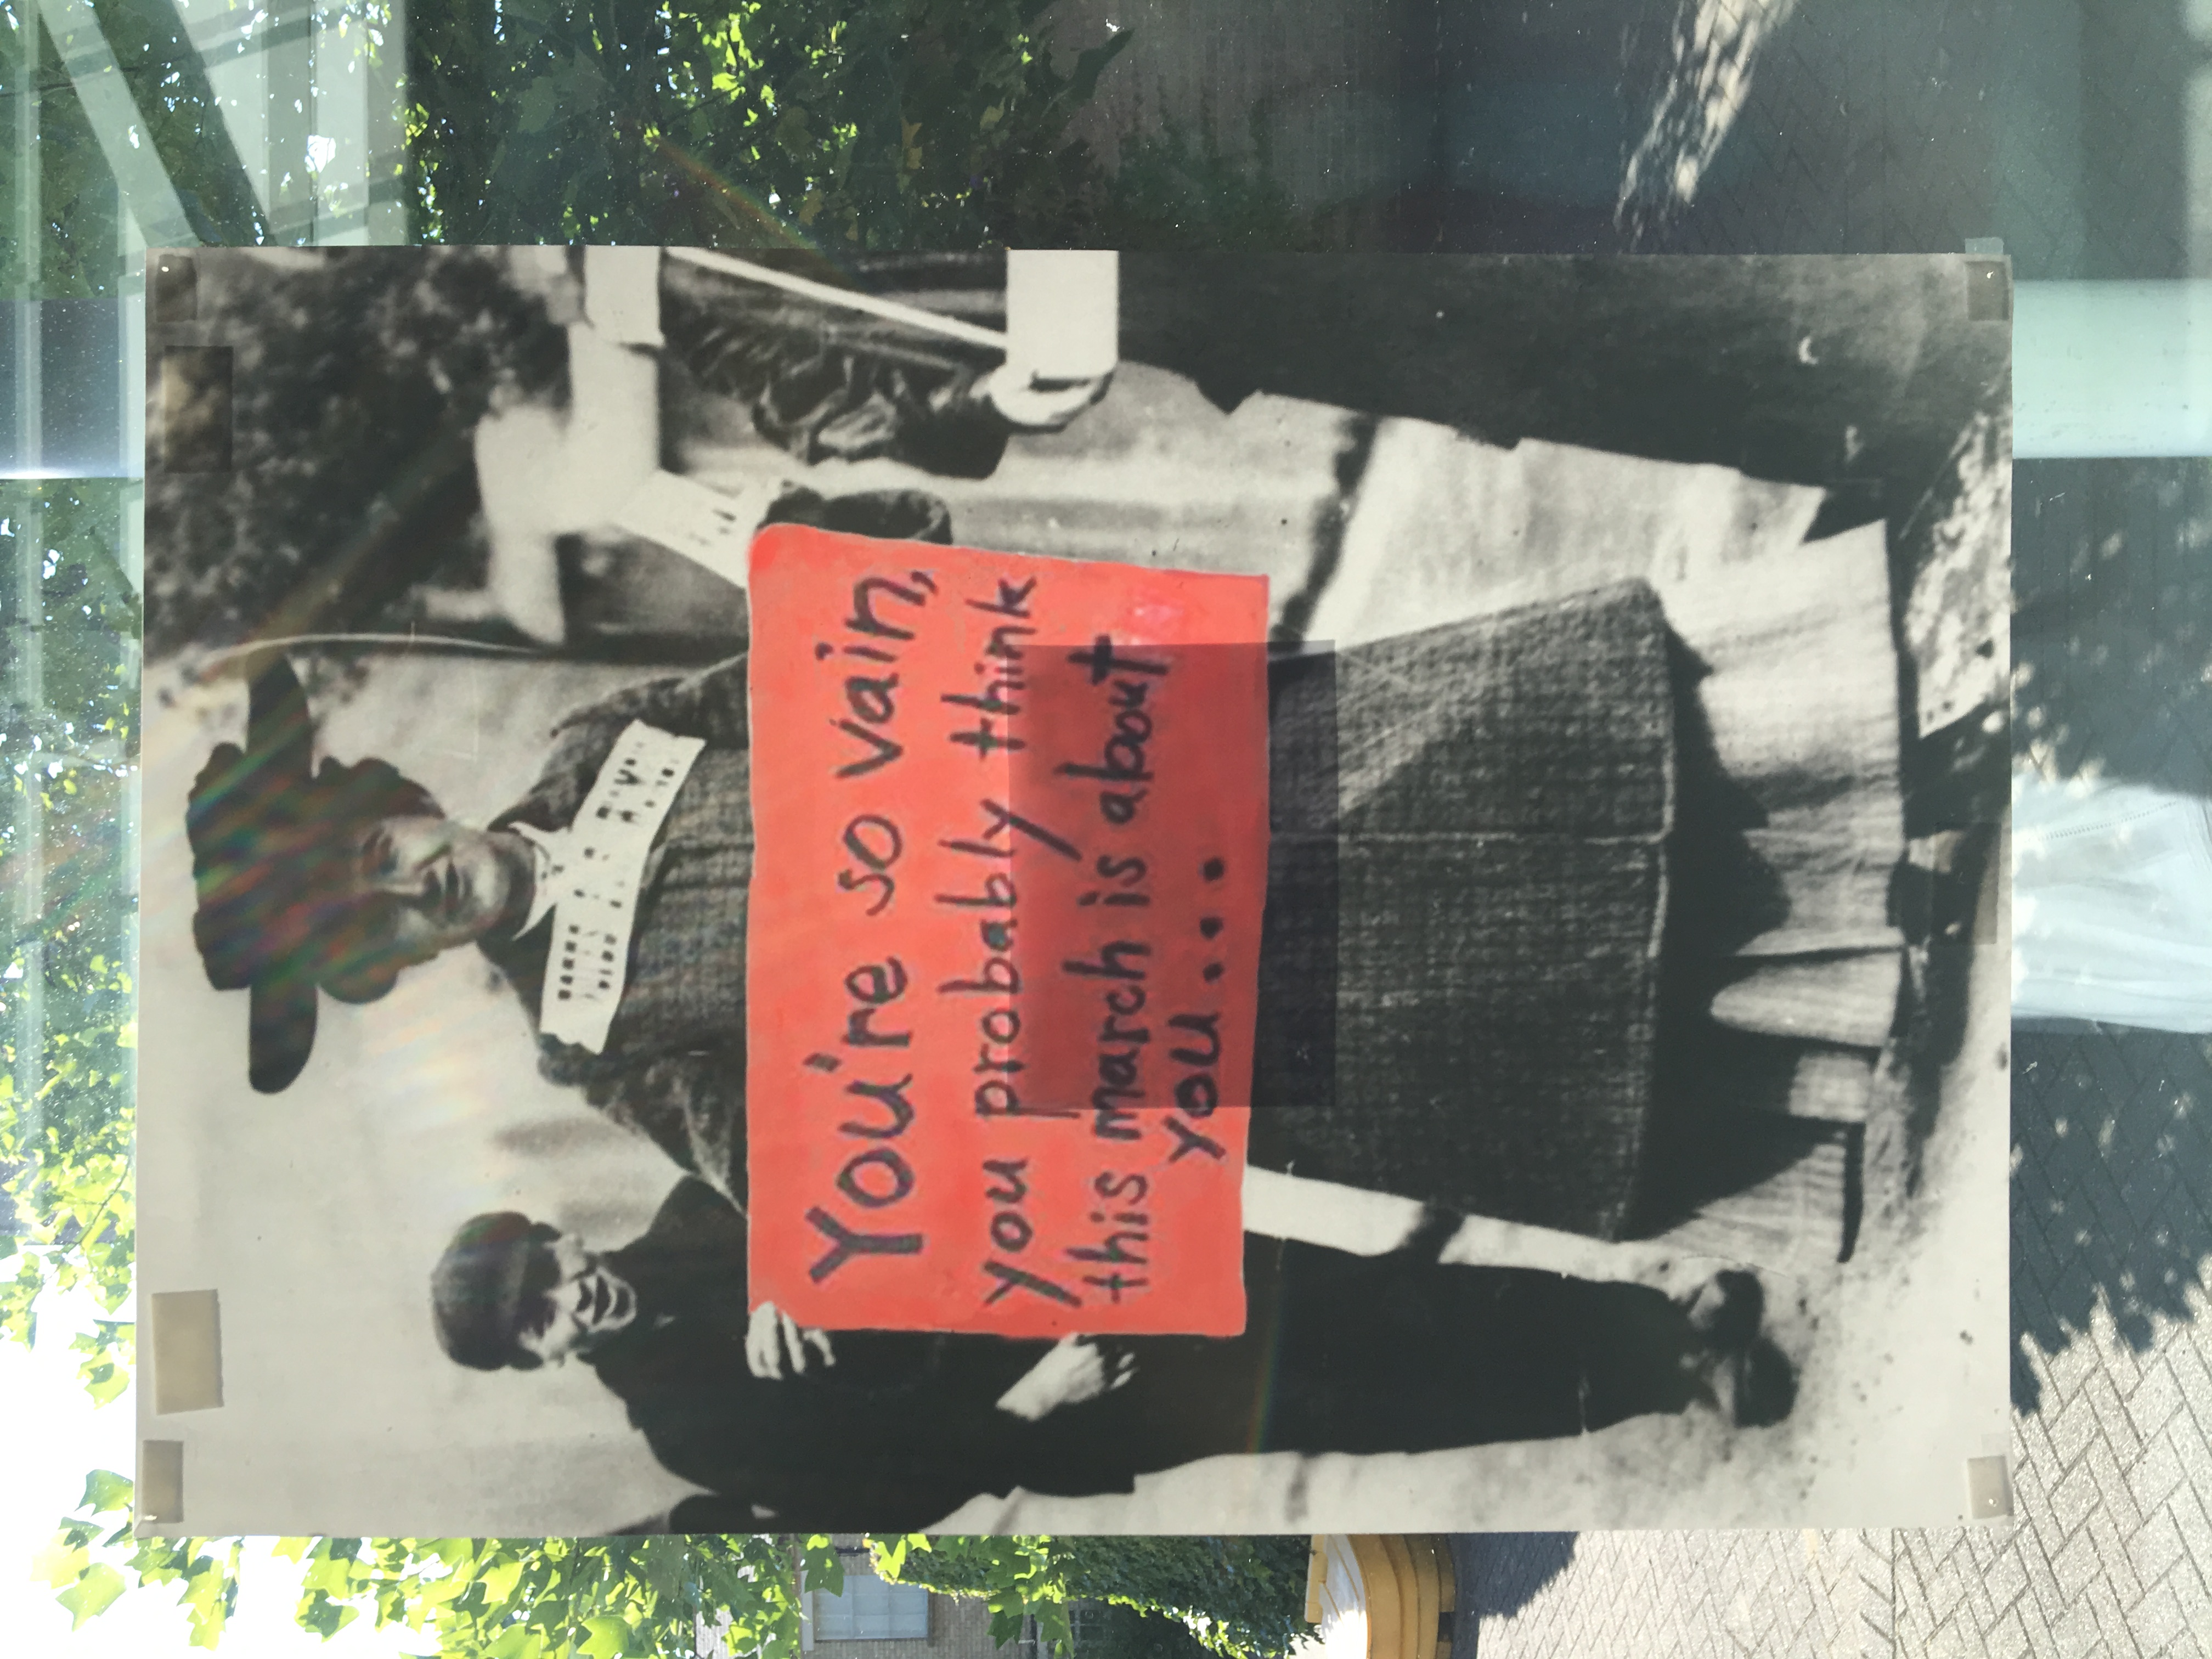 58e. Suffragette Marches, Felicity Beaumont, 40.5 x 59 x 0.1, £ offers